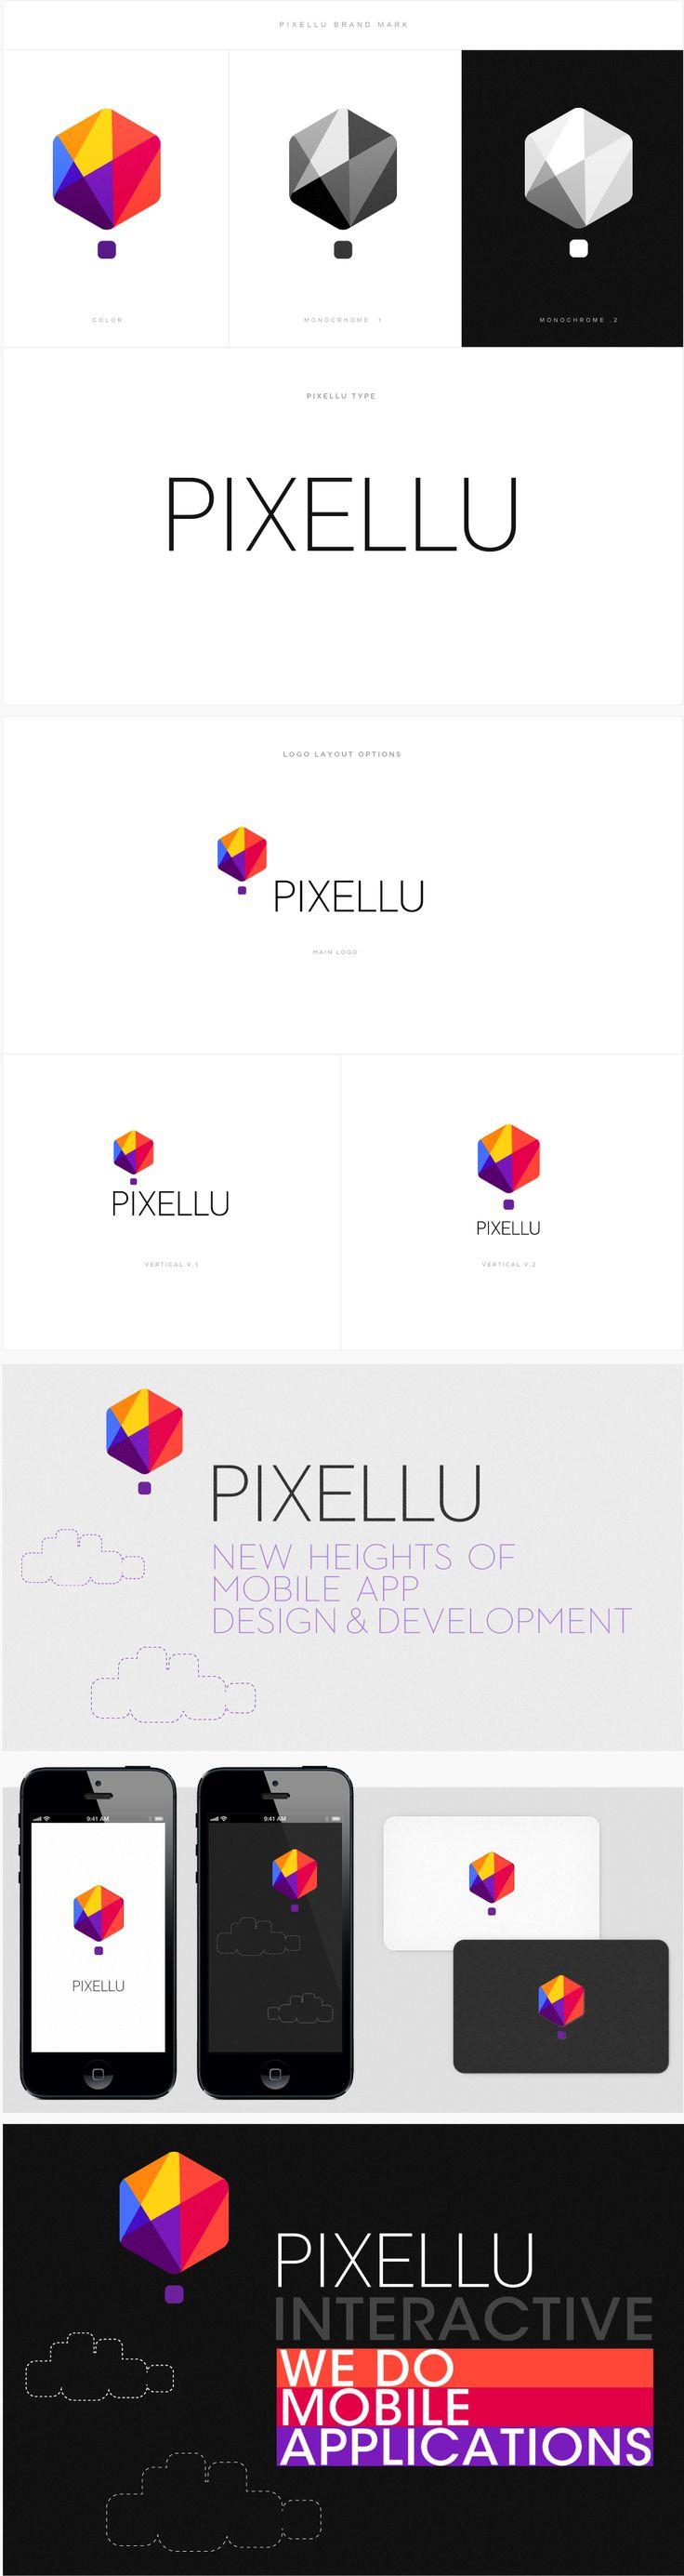 Pixellu - Flosites Creative Agency